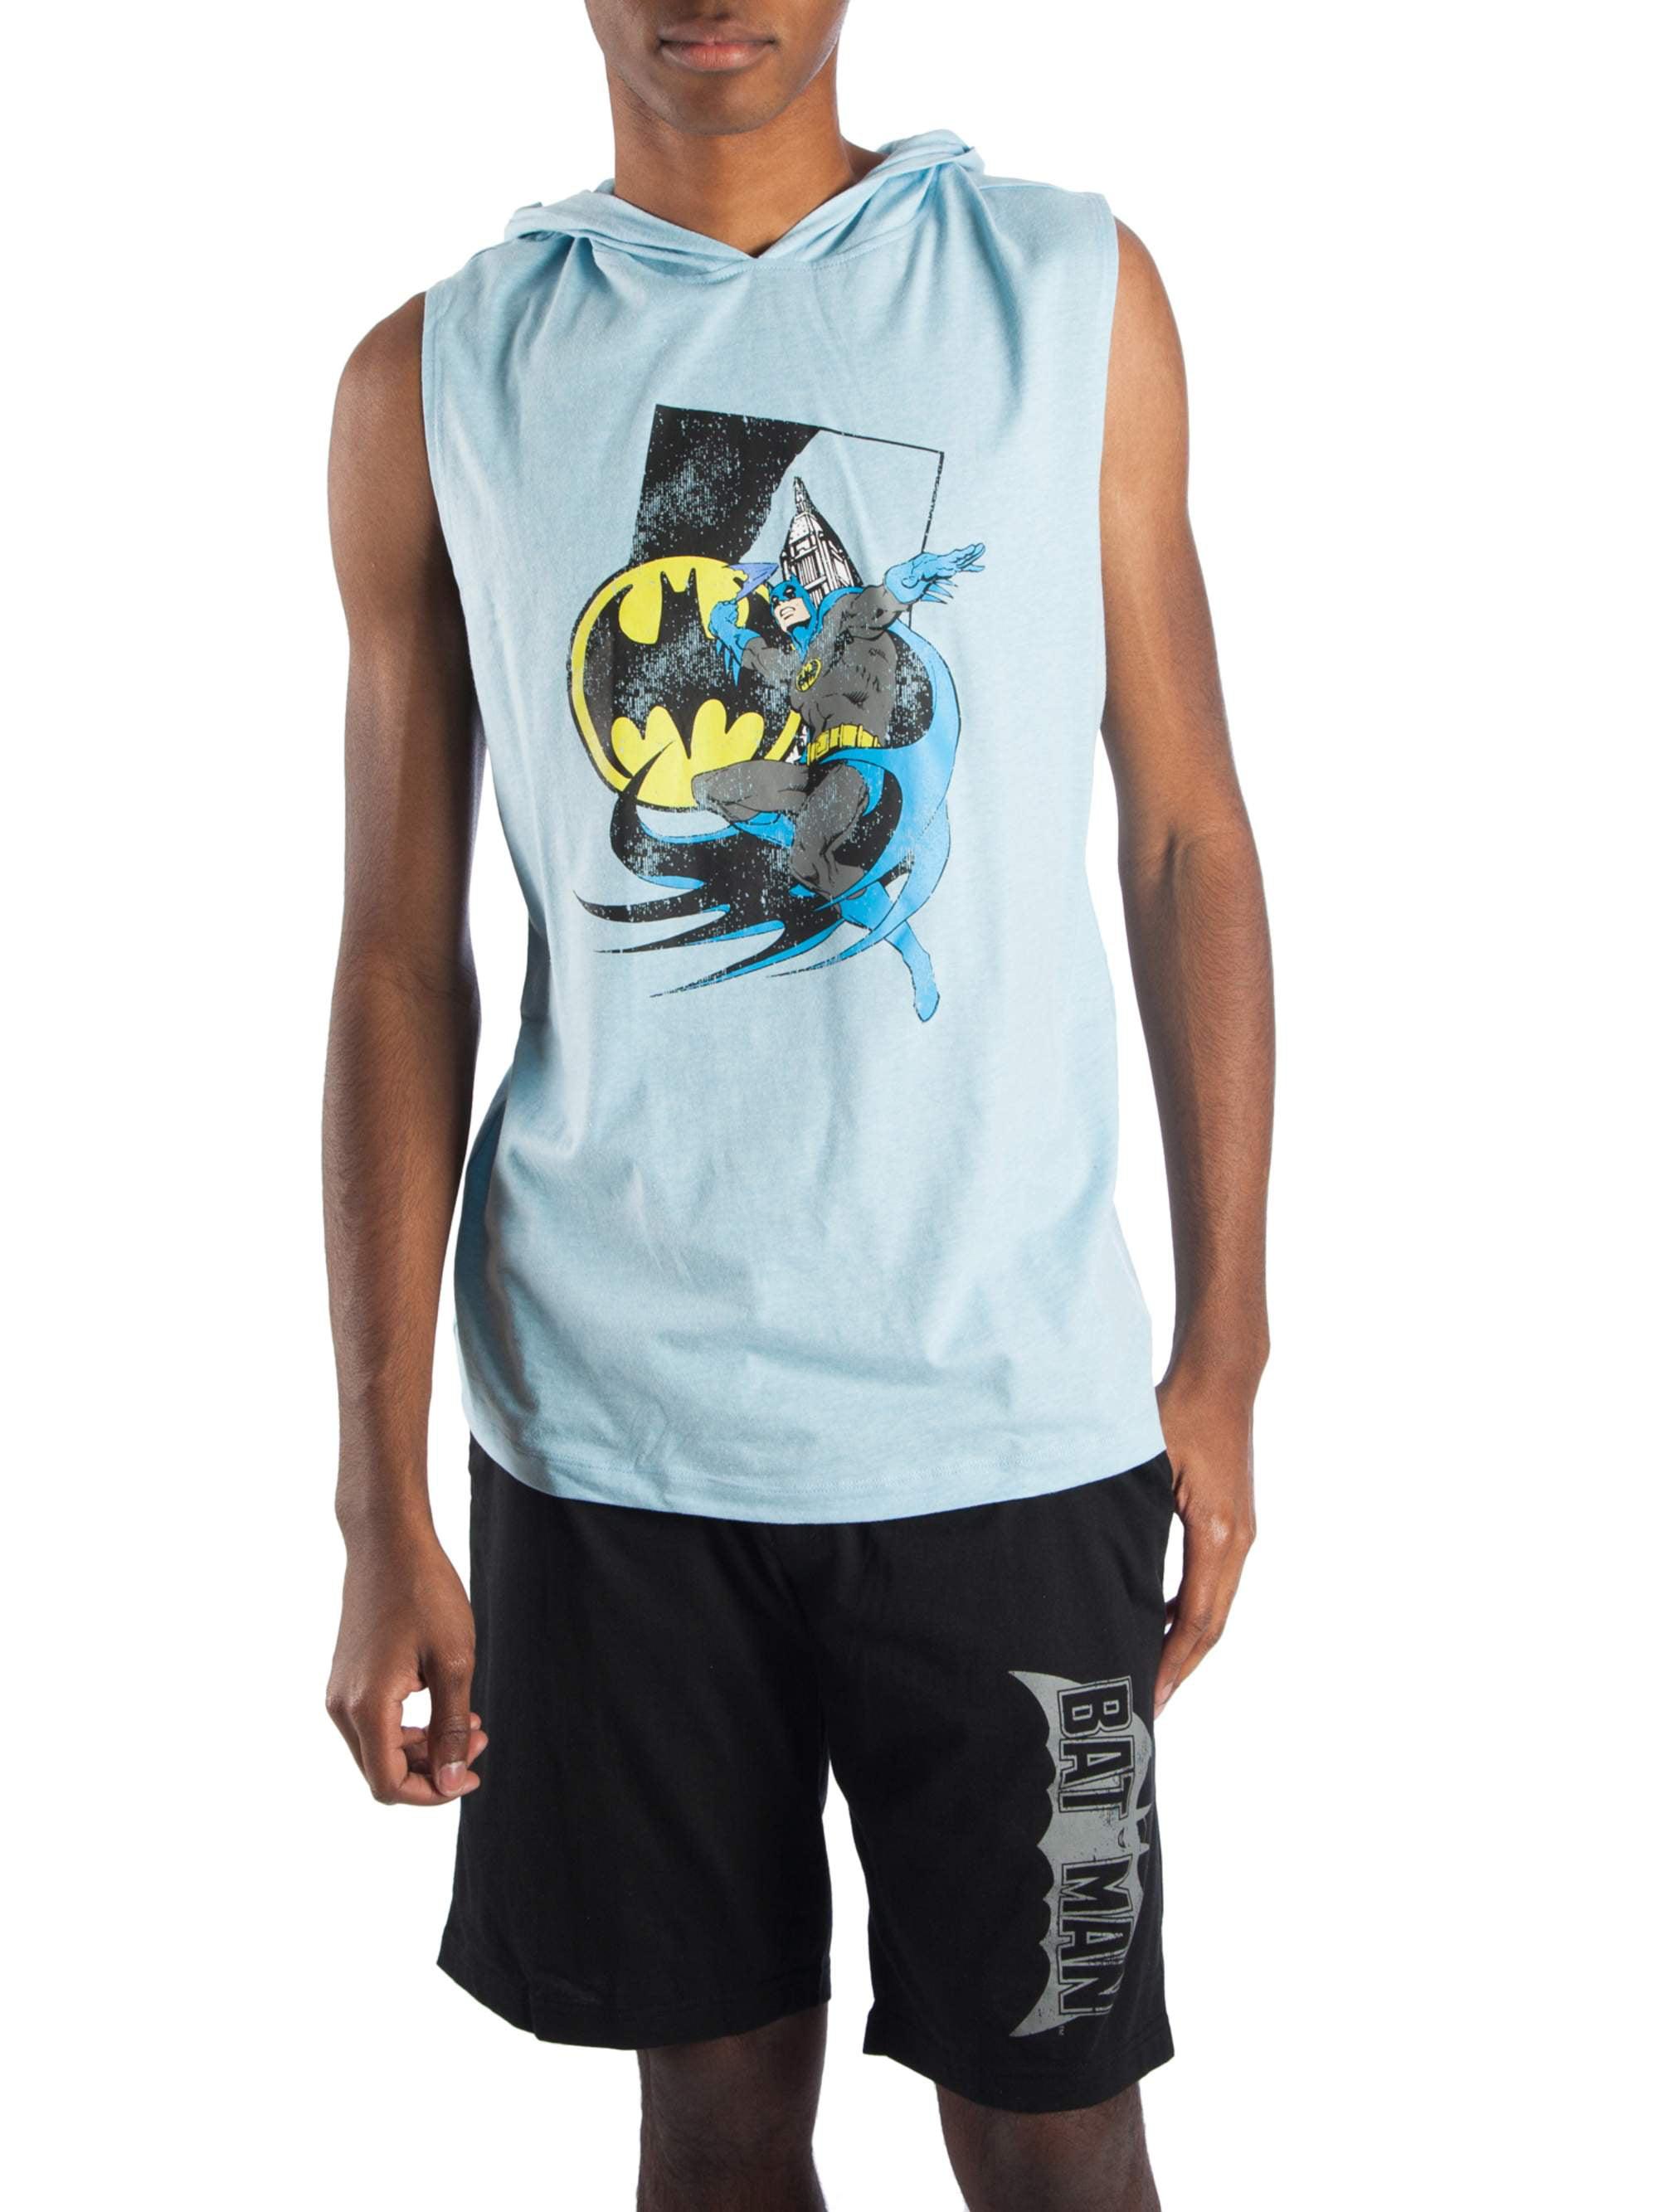 Men's 2 Piece Classic Batman Muscle Tee Hoodie and Sleep Short Lounge Pajama Combo by Generic